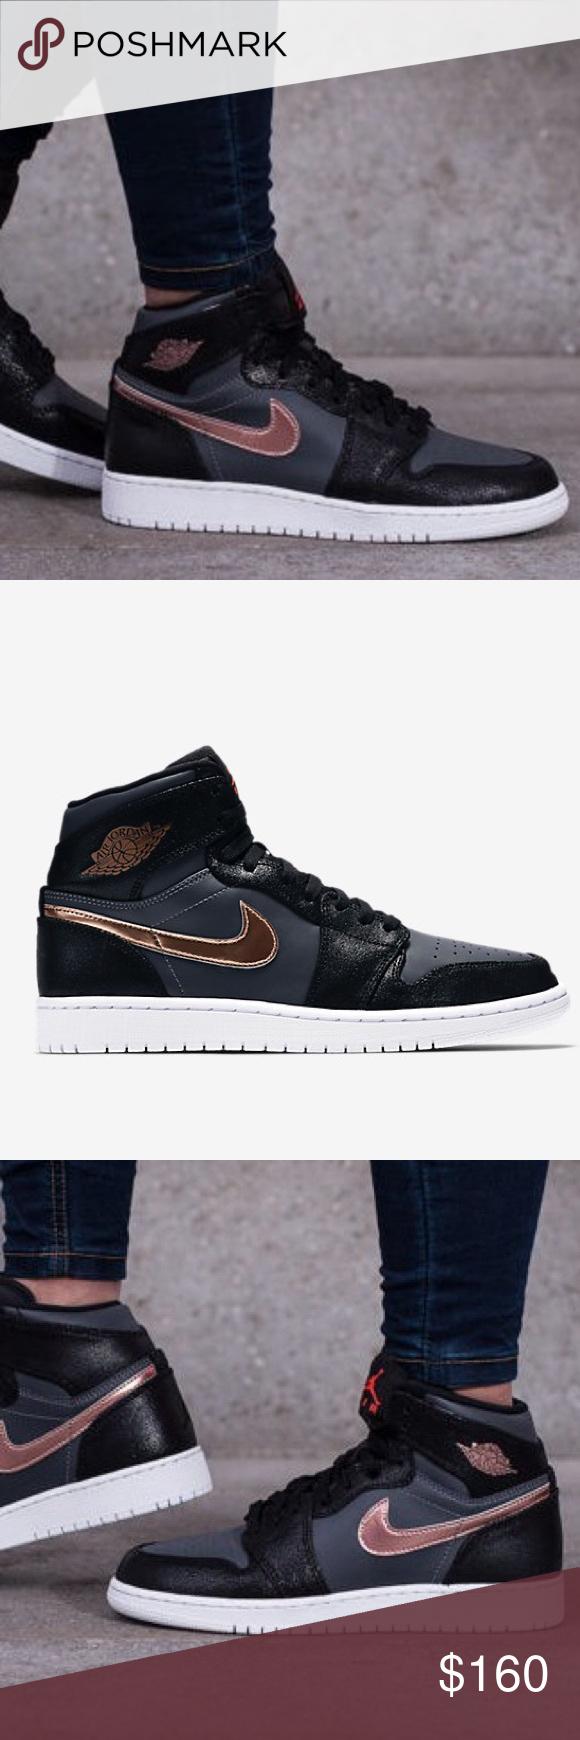 Nike Air Jordan one retro high black shoes NWT (With